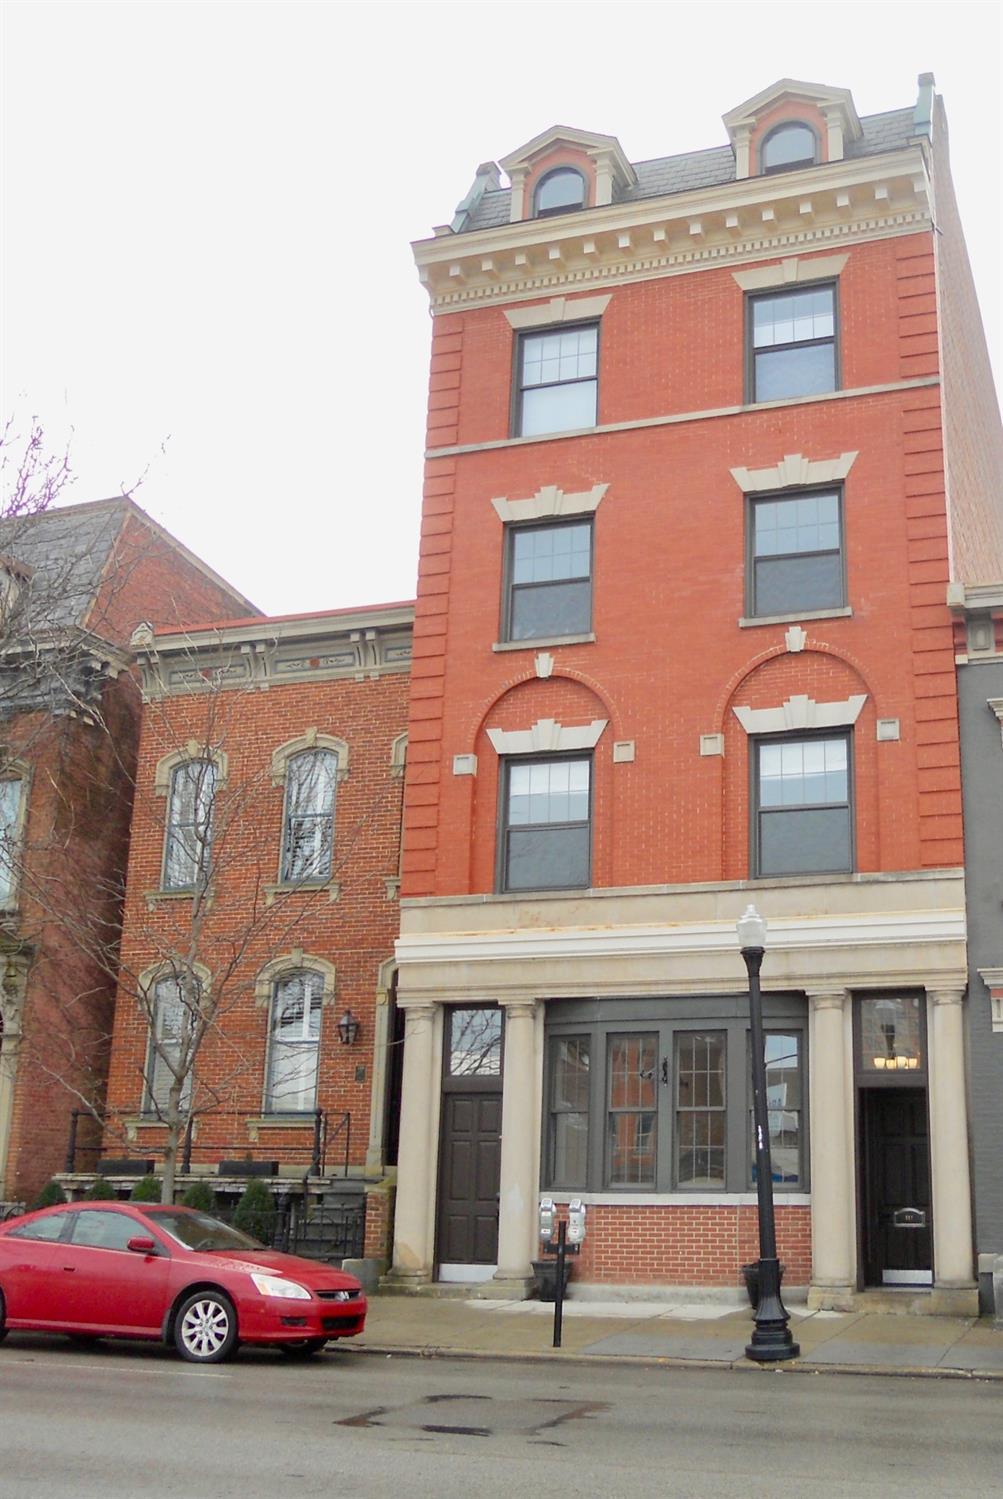 Property for sale at 221 W Ninth Street, Cincinnati,  Ohio 45202